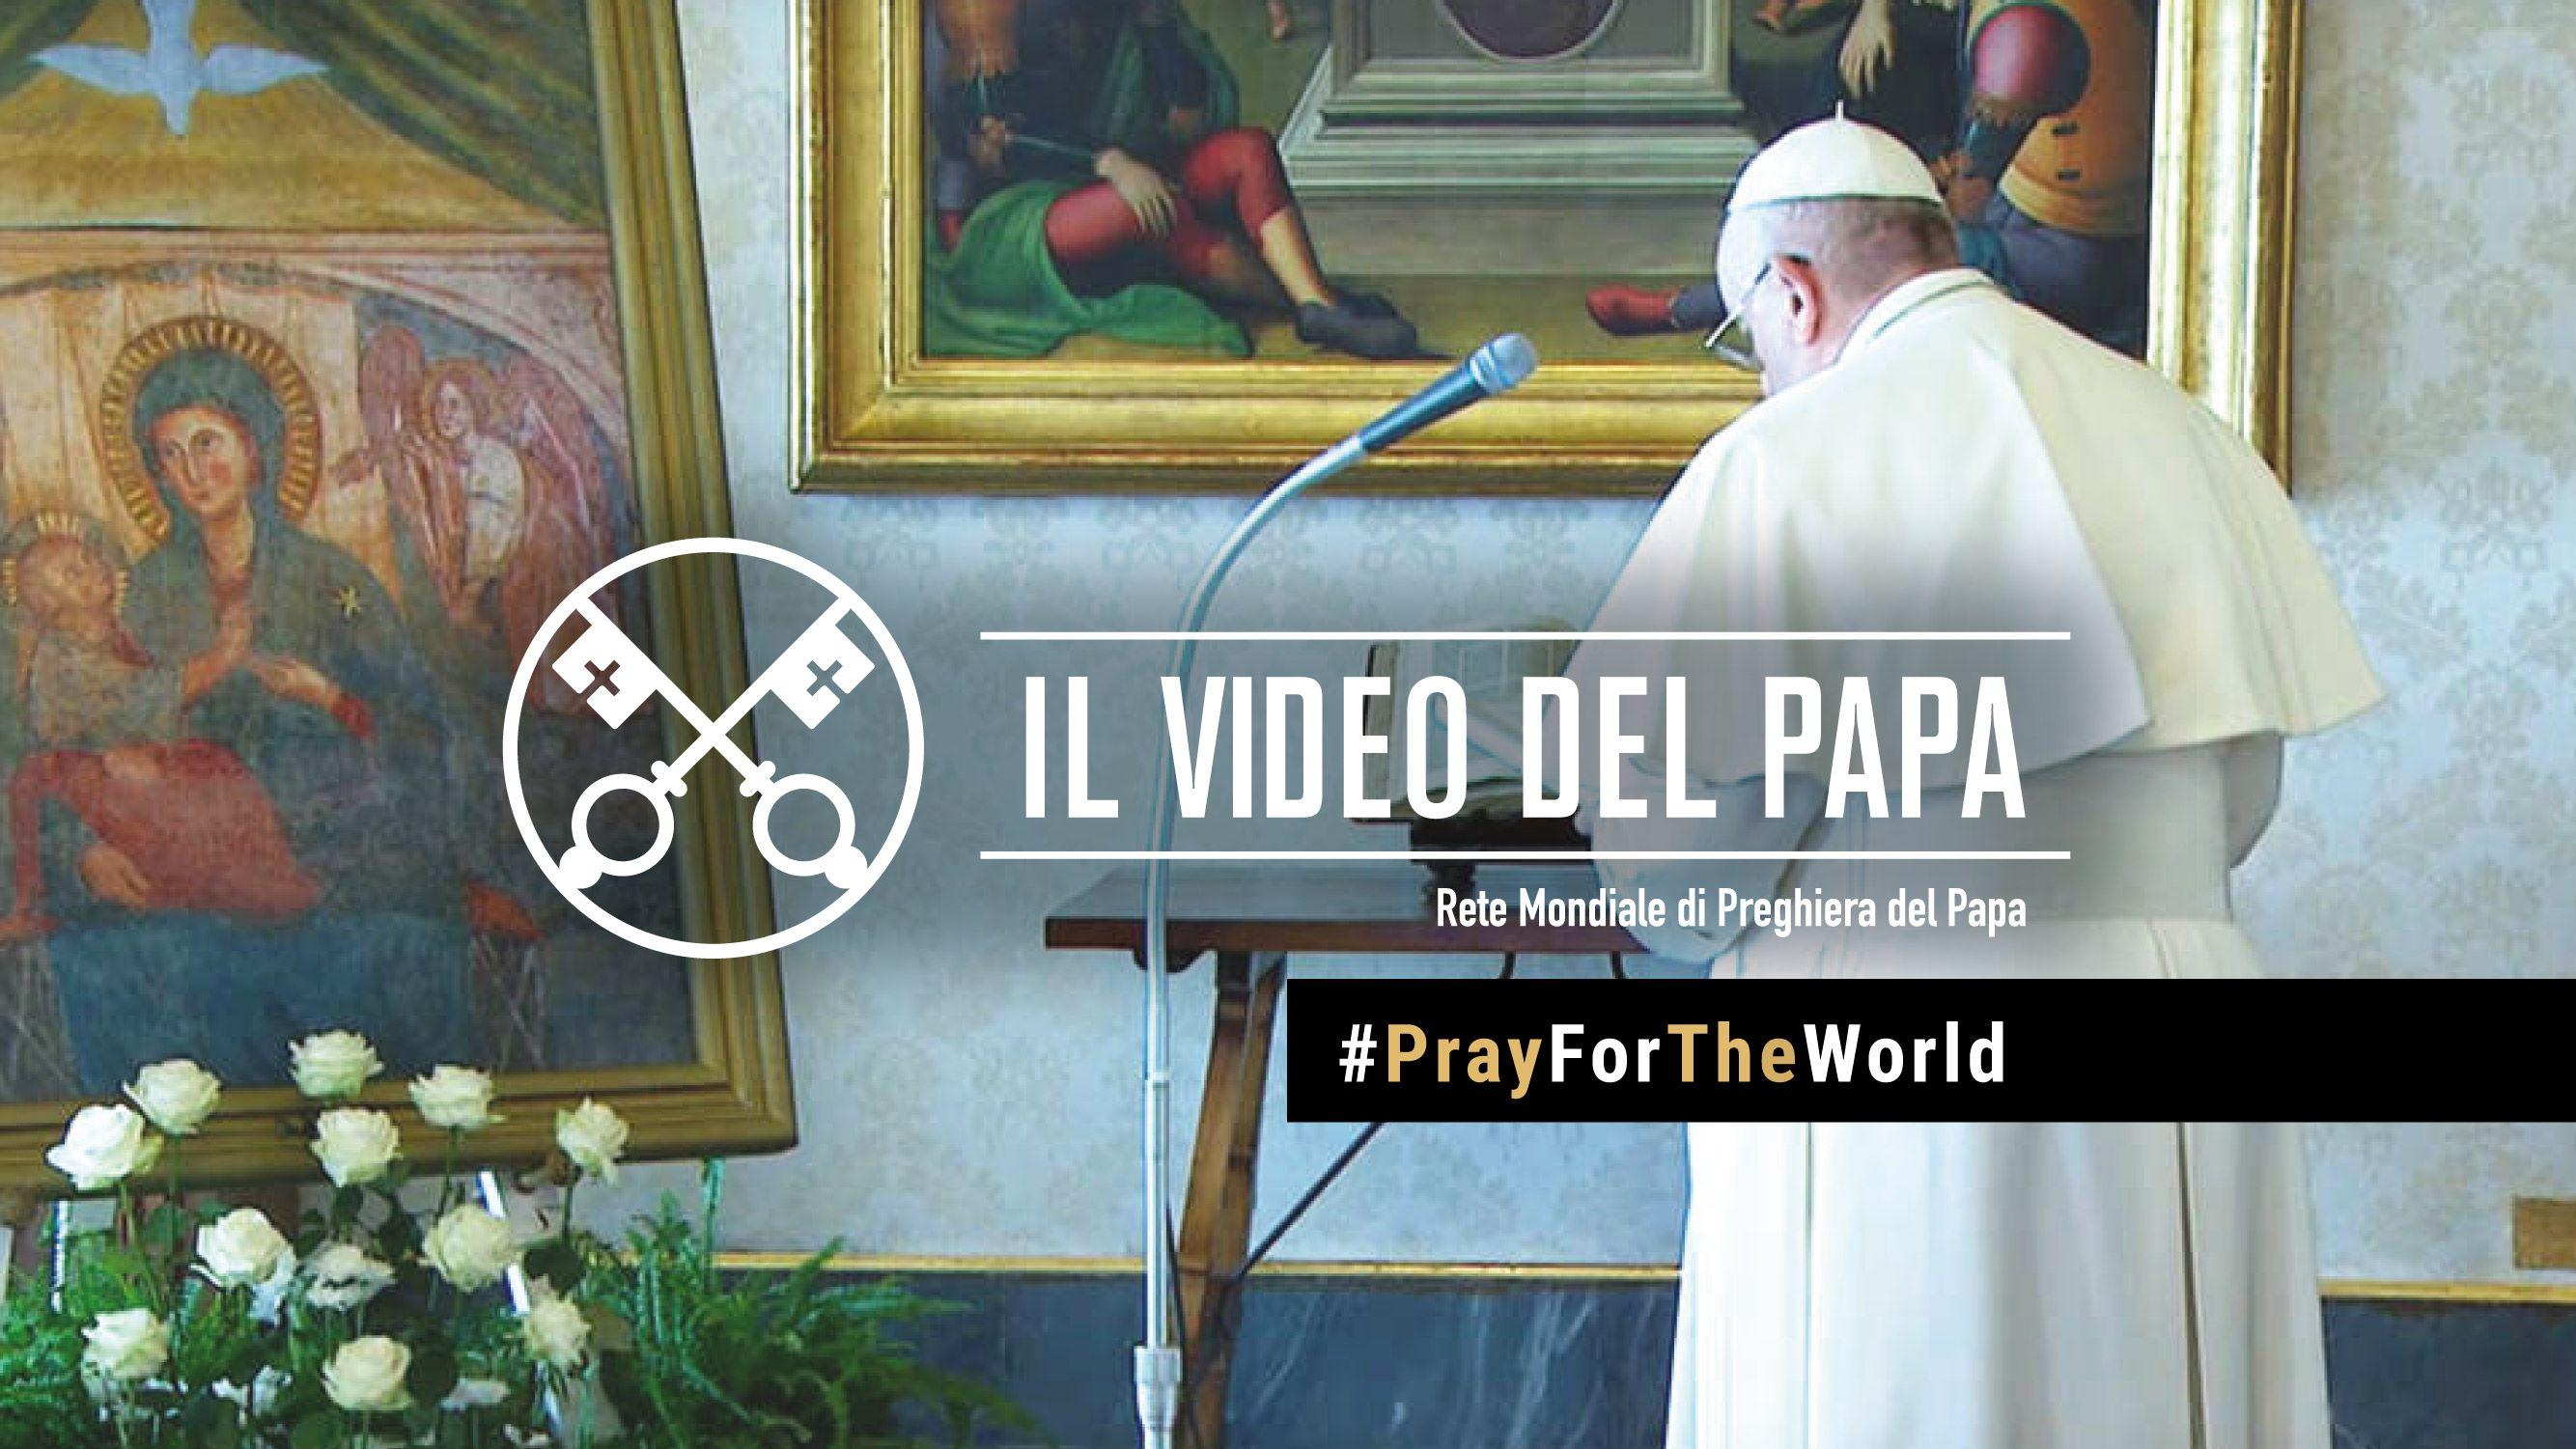 Official Image - TPV PFTW 2020 IT - Il Video del Papa - #PrayForTheWorld